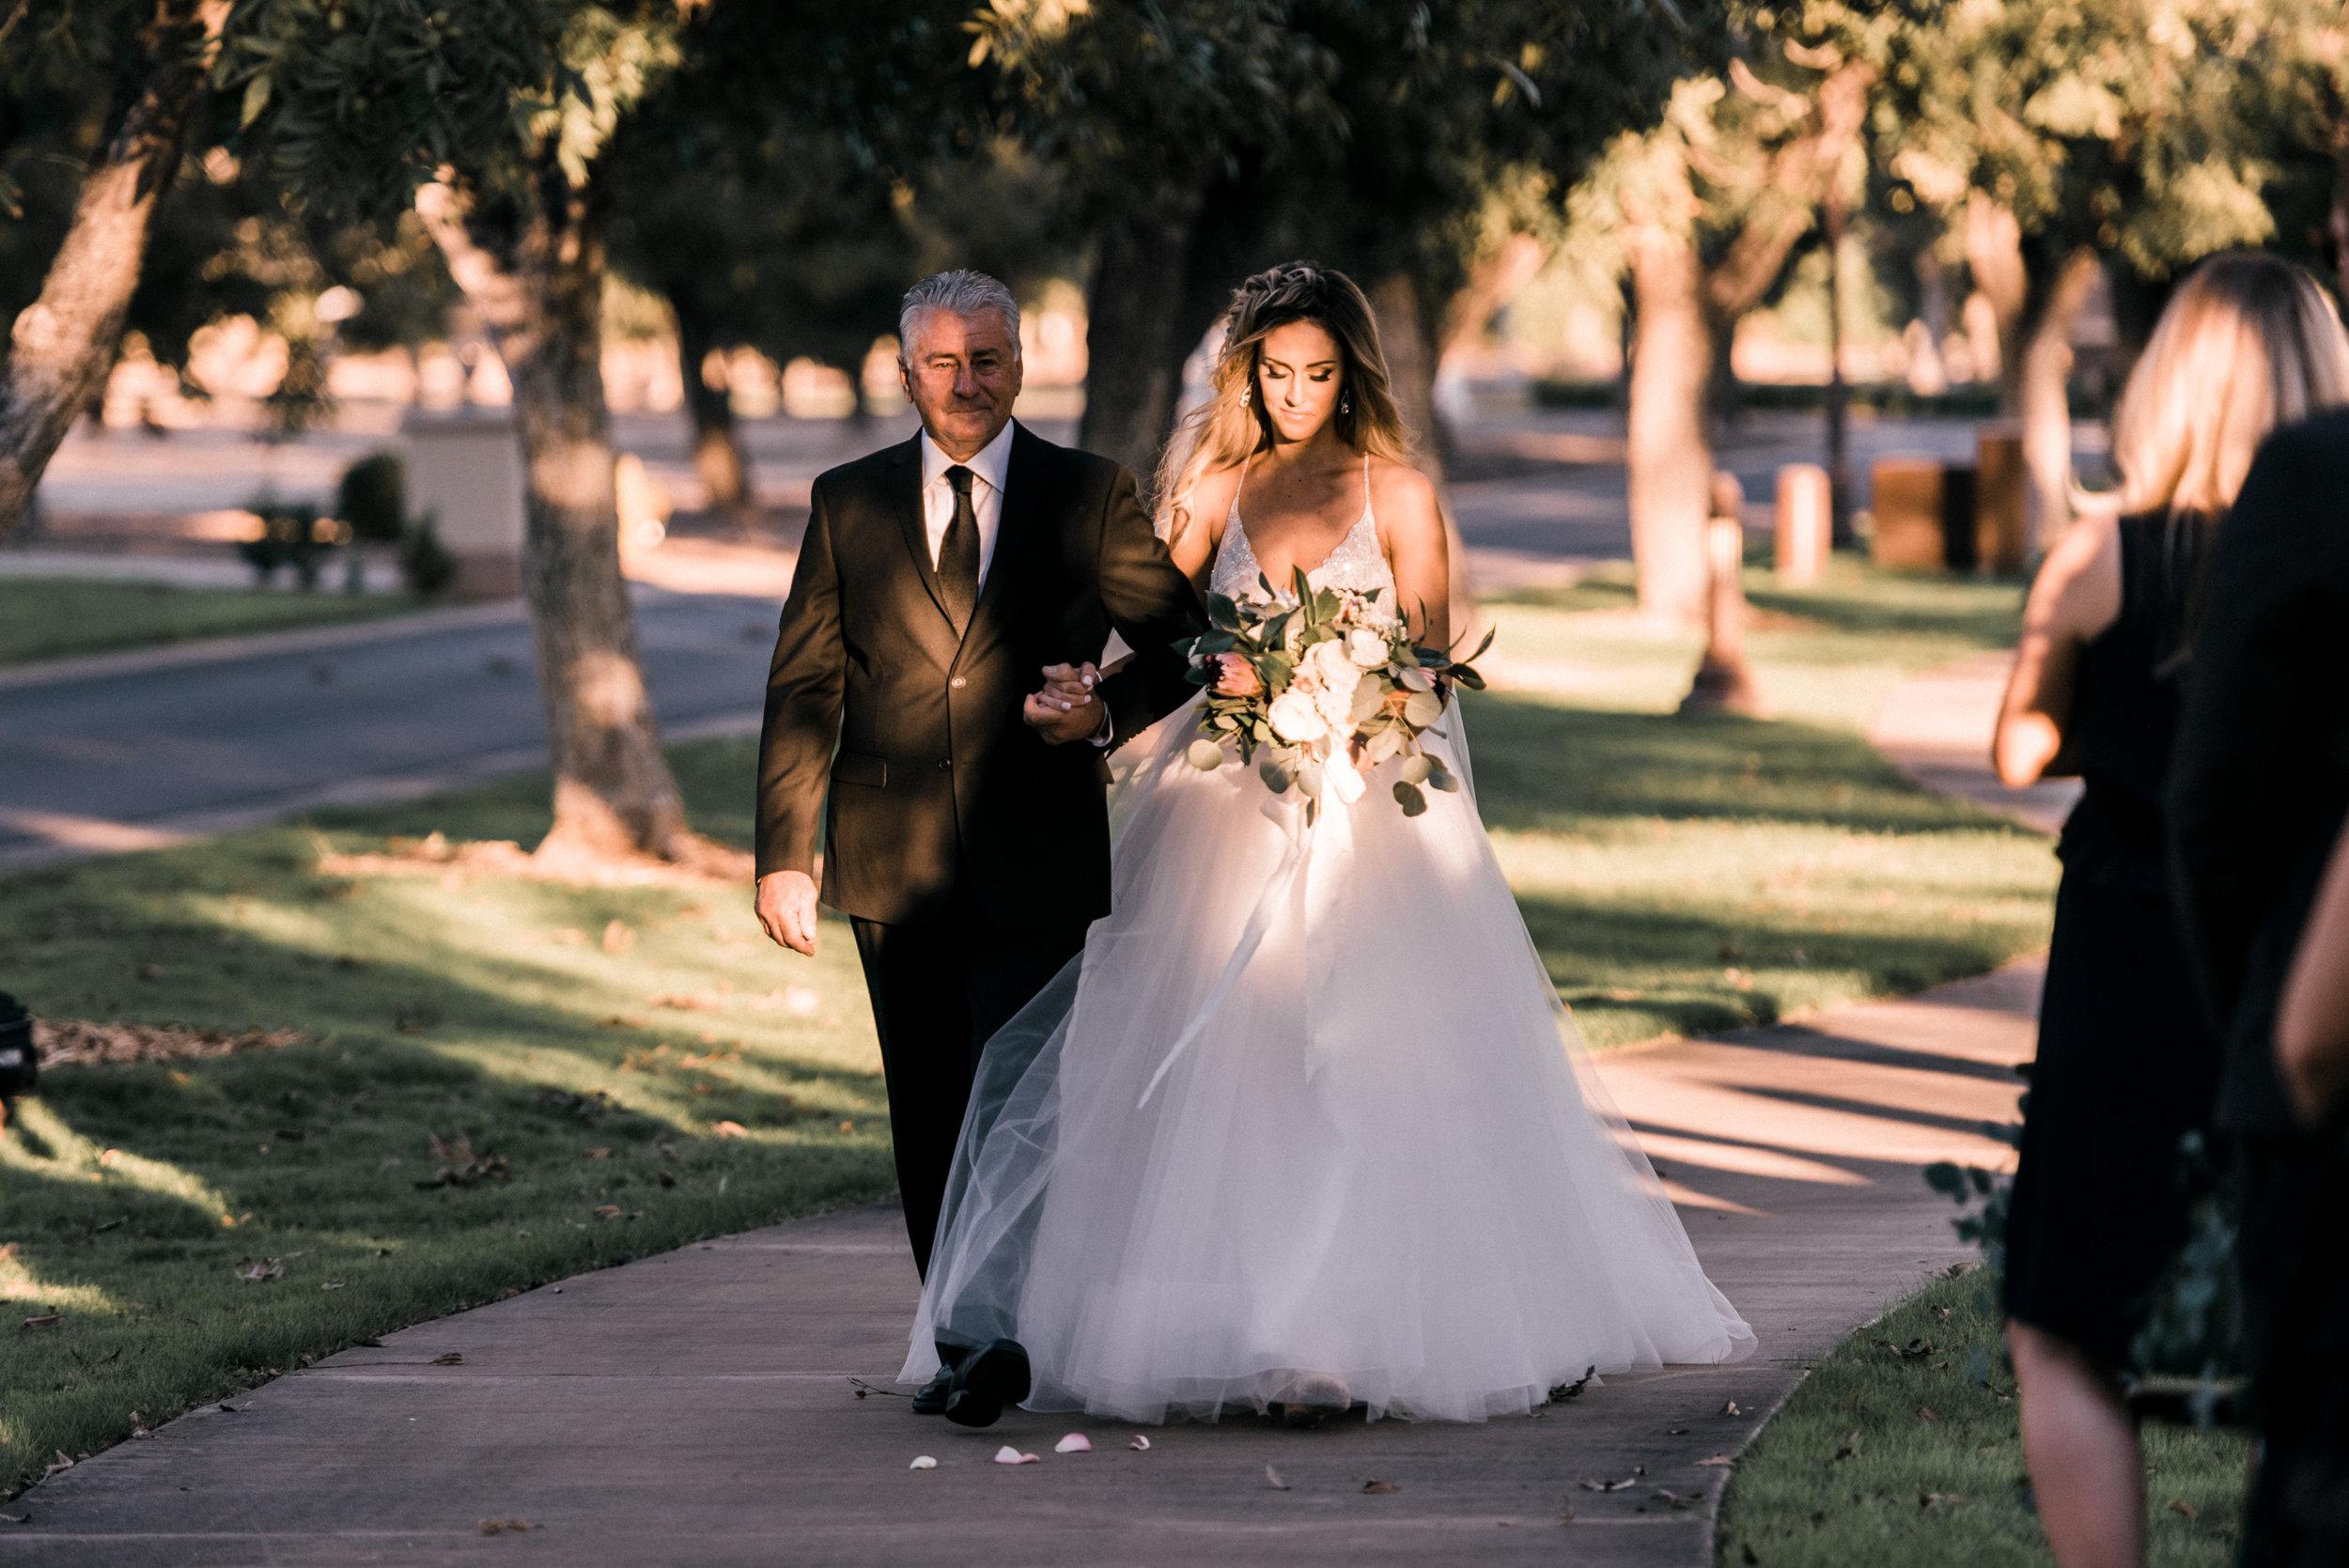 Moody, Romantic Arizona Wedding - Walk down the aisle